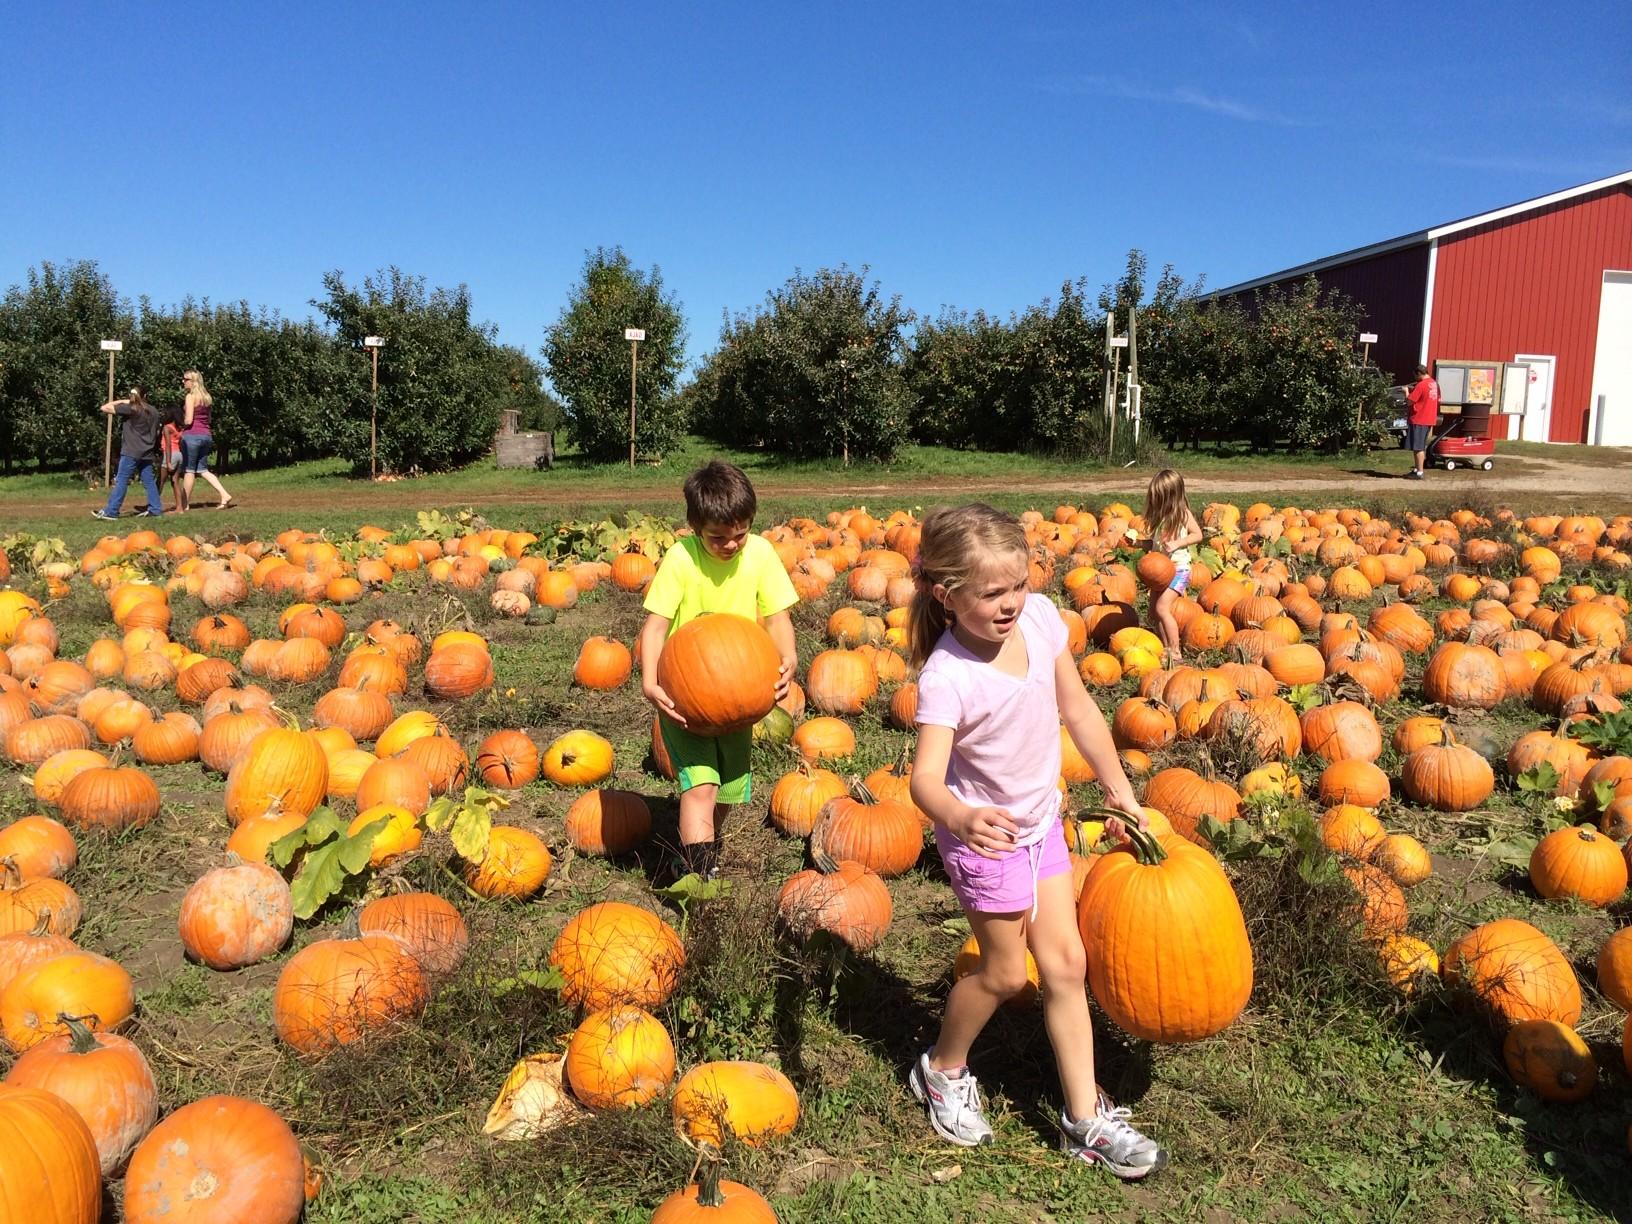 Joe-Holzka-Community-Garden-Pumpkin-Festival-1.jpg